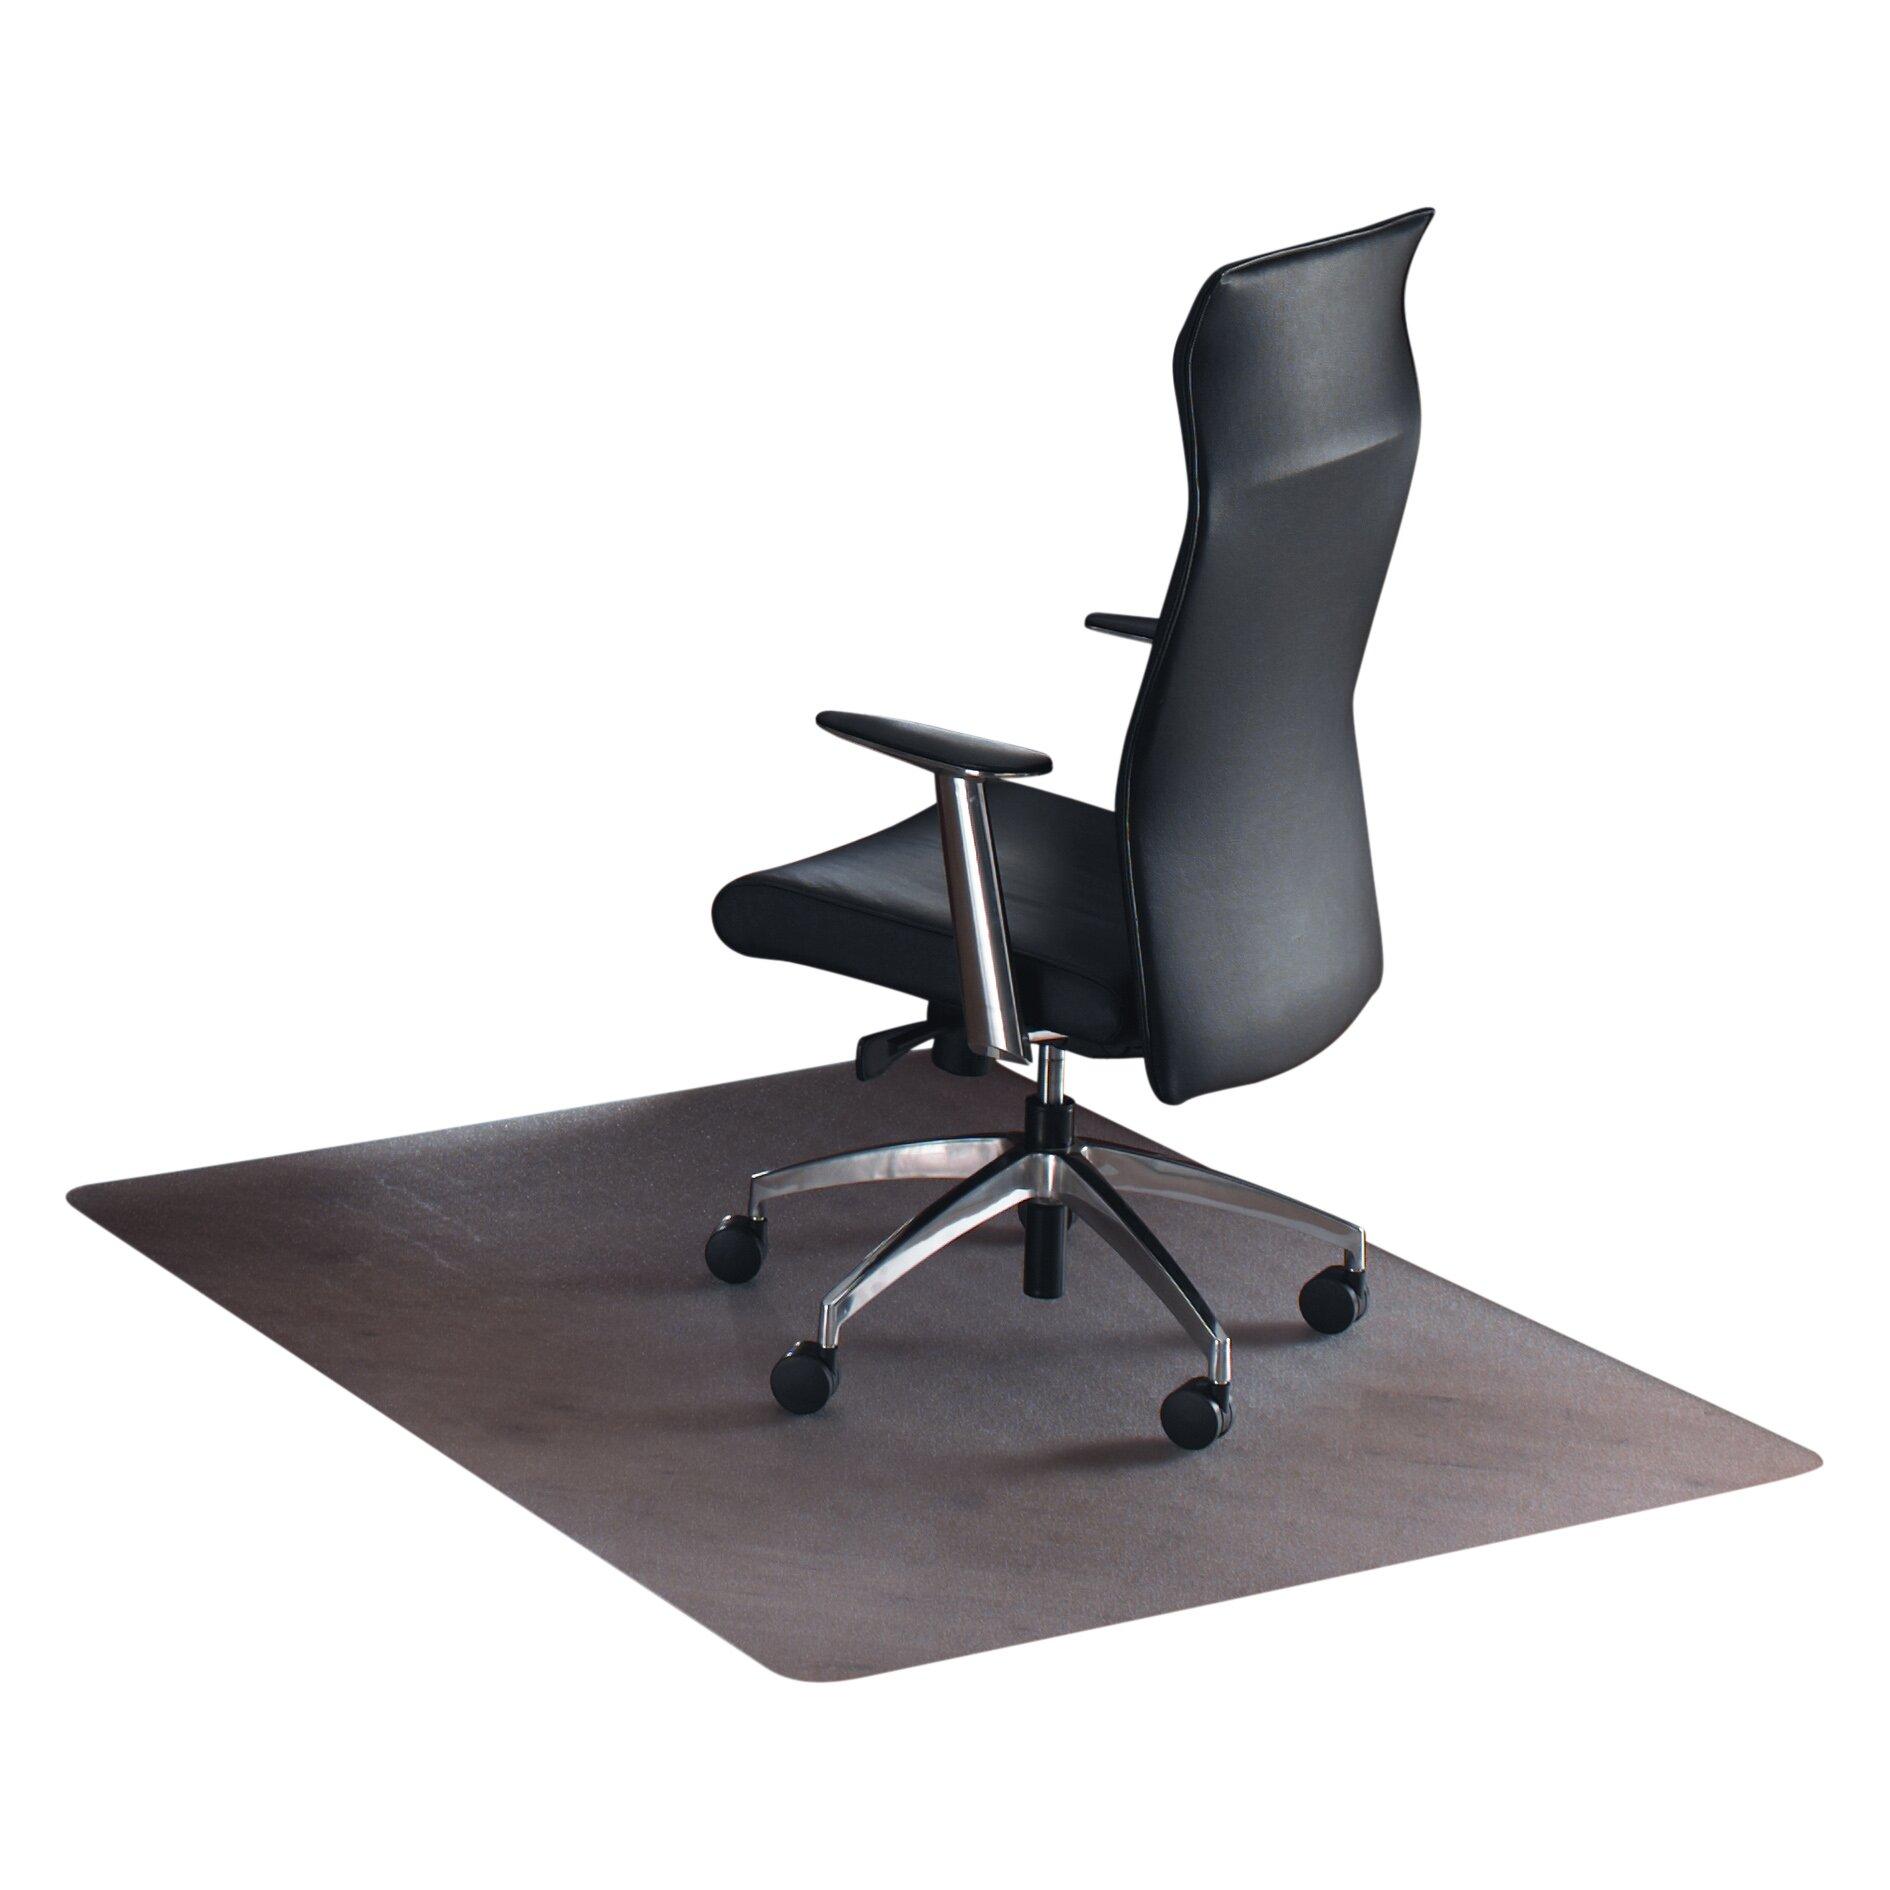 best of images of hard floor chair mat